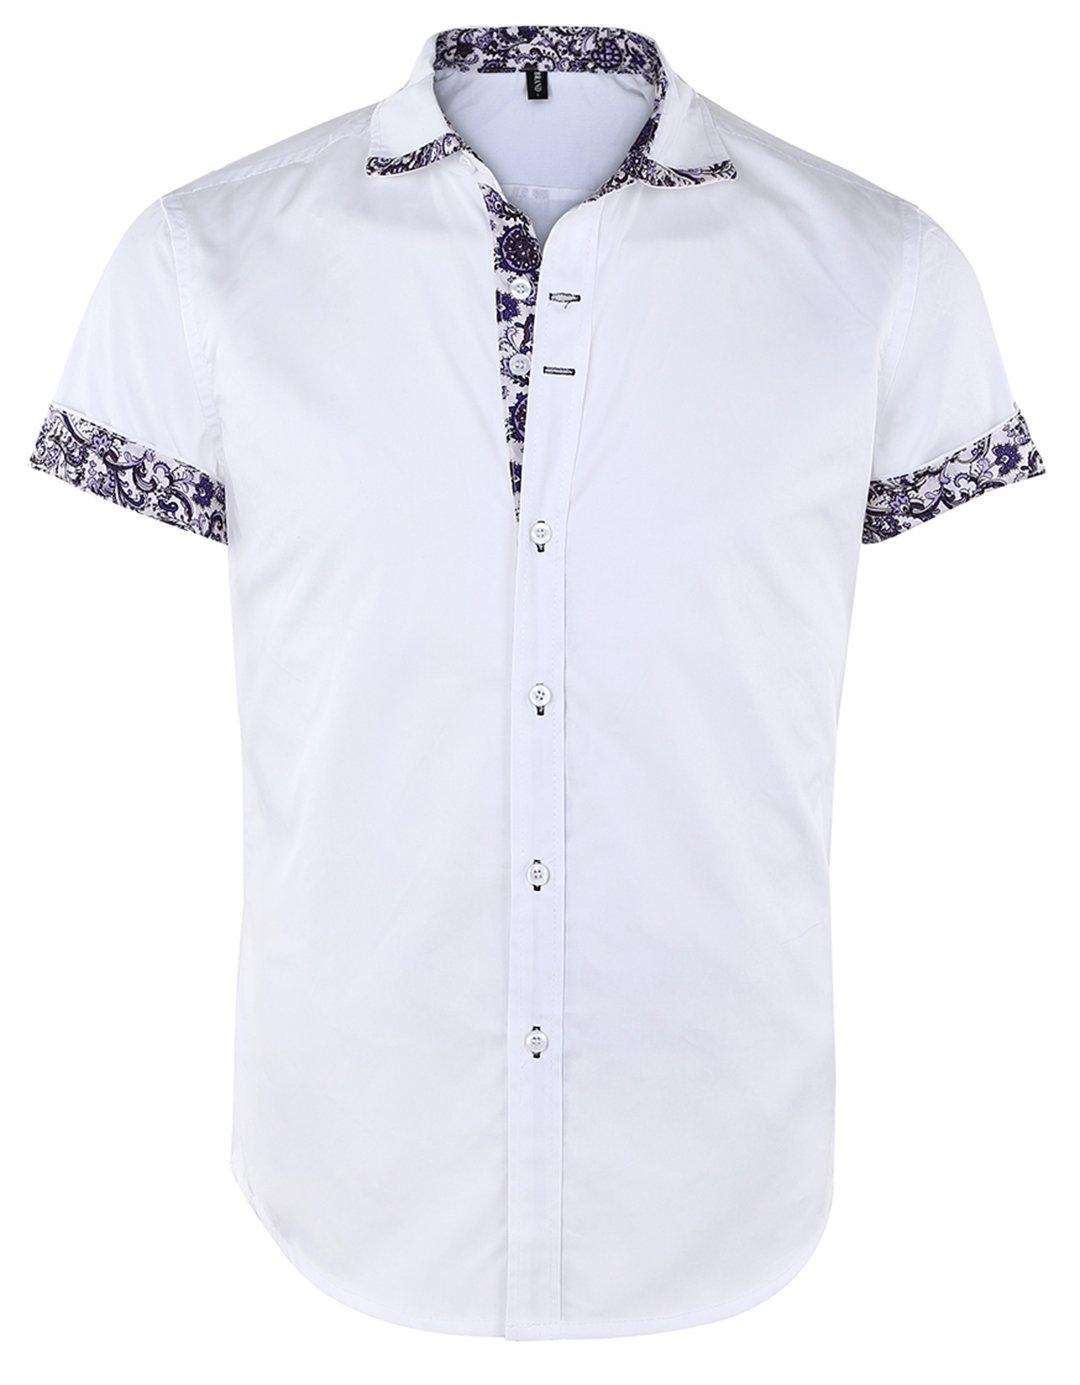 JEETOO Men's Floral Shirts Short Sleeve Print Dress Shirt Button Down Summer Casual Shirt (Small, White)